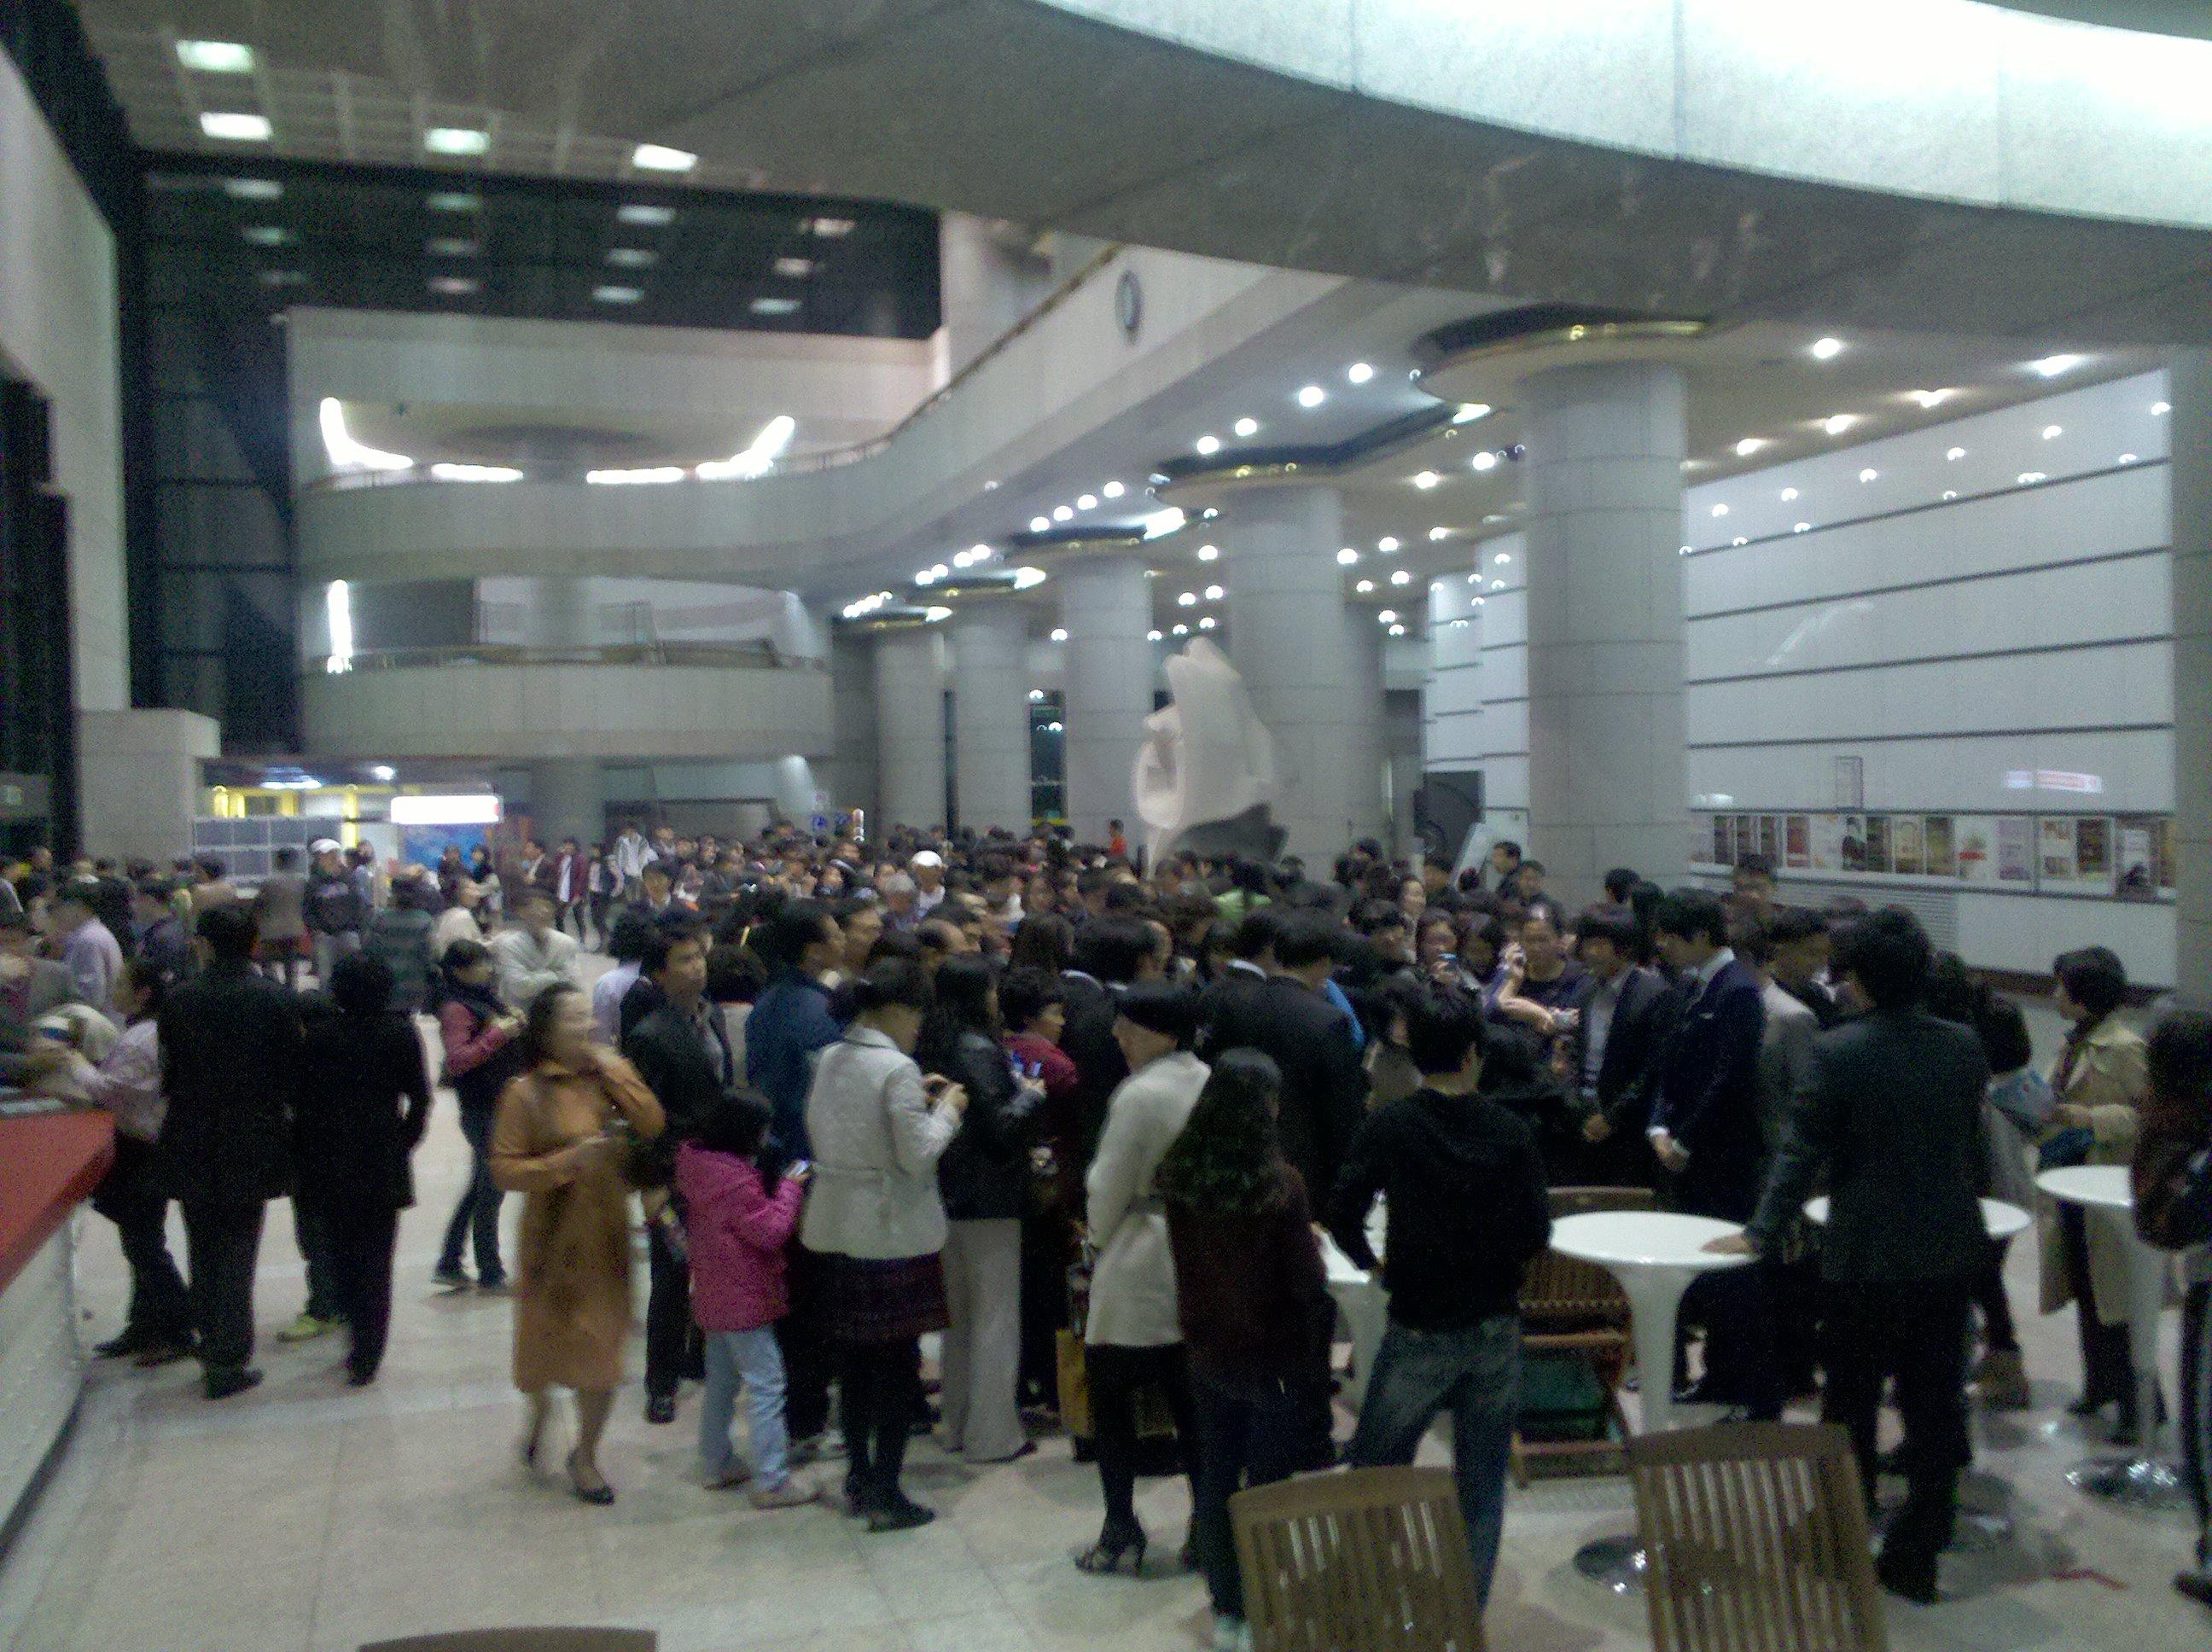 Rose Jang 10.31 전국투어마지막광주공연후 팬사인회